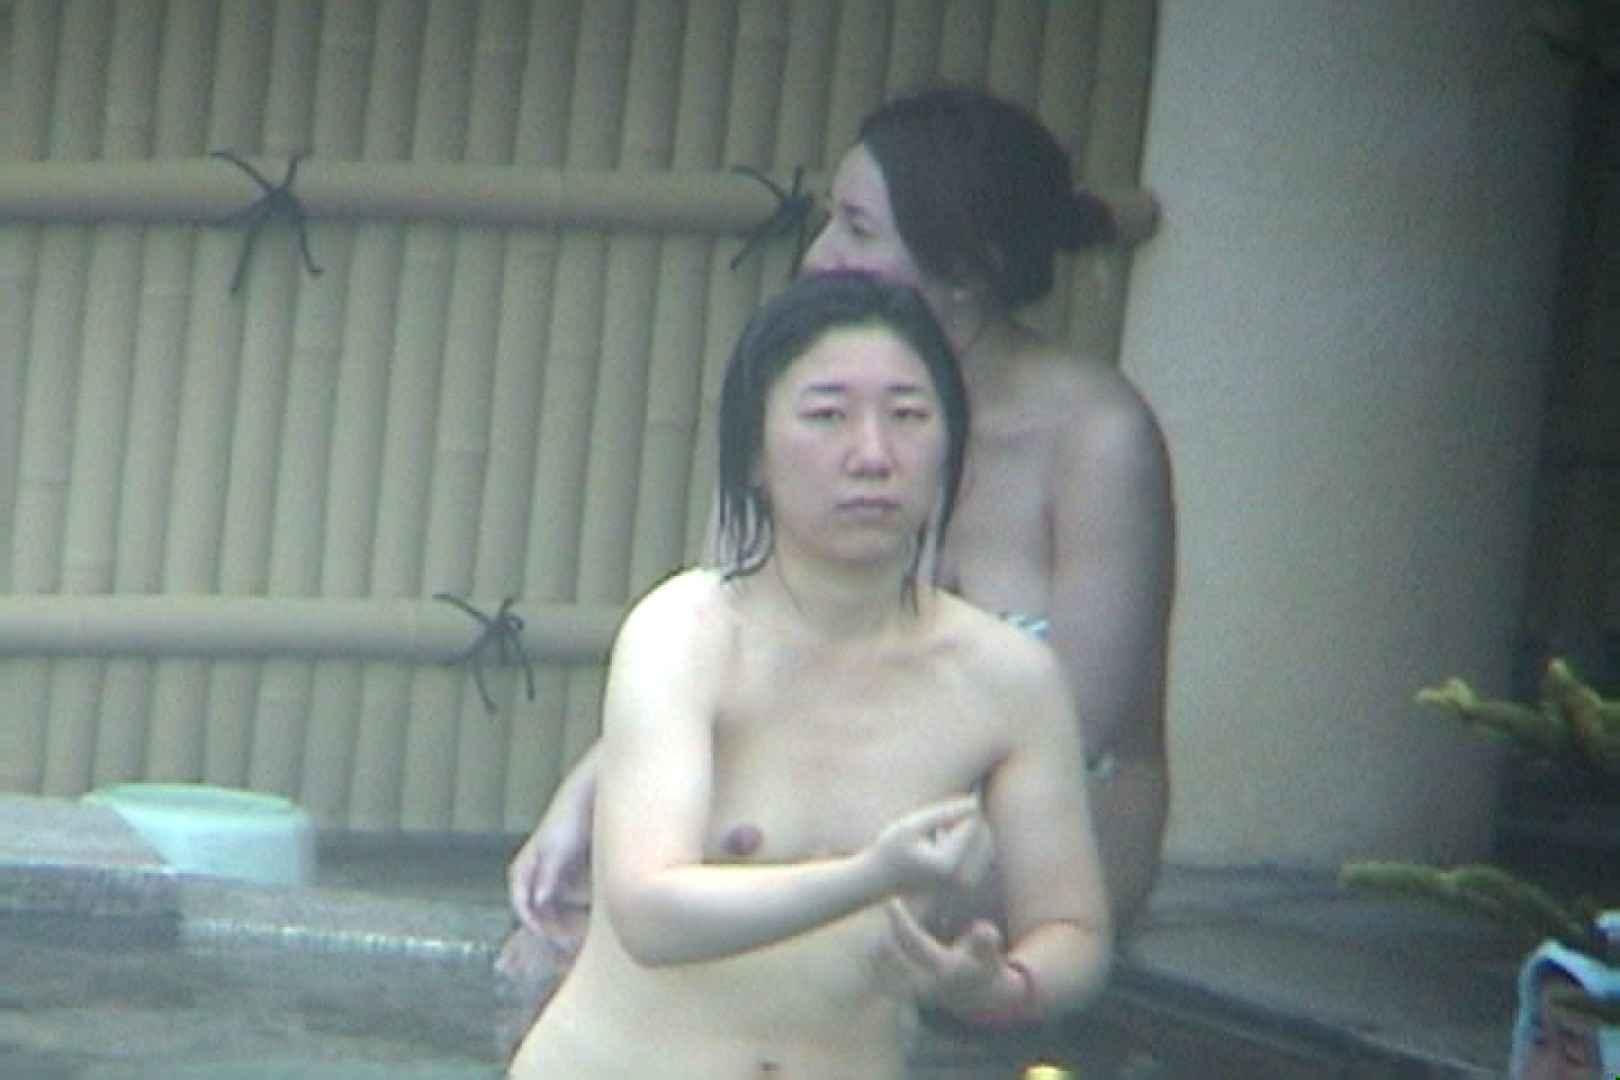 Aquaな露天風呂Vol.106 OLセックス 隠し撮りおまんこ動画流出 51画像 44